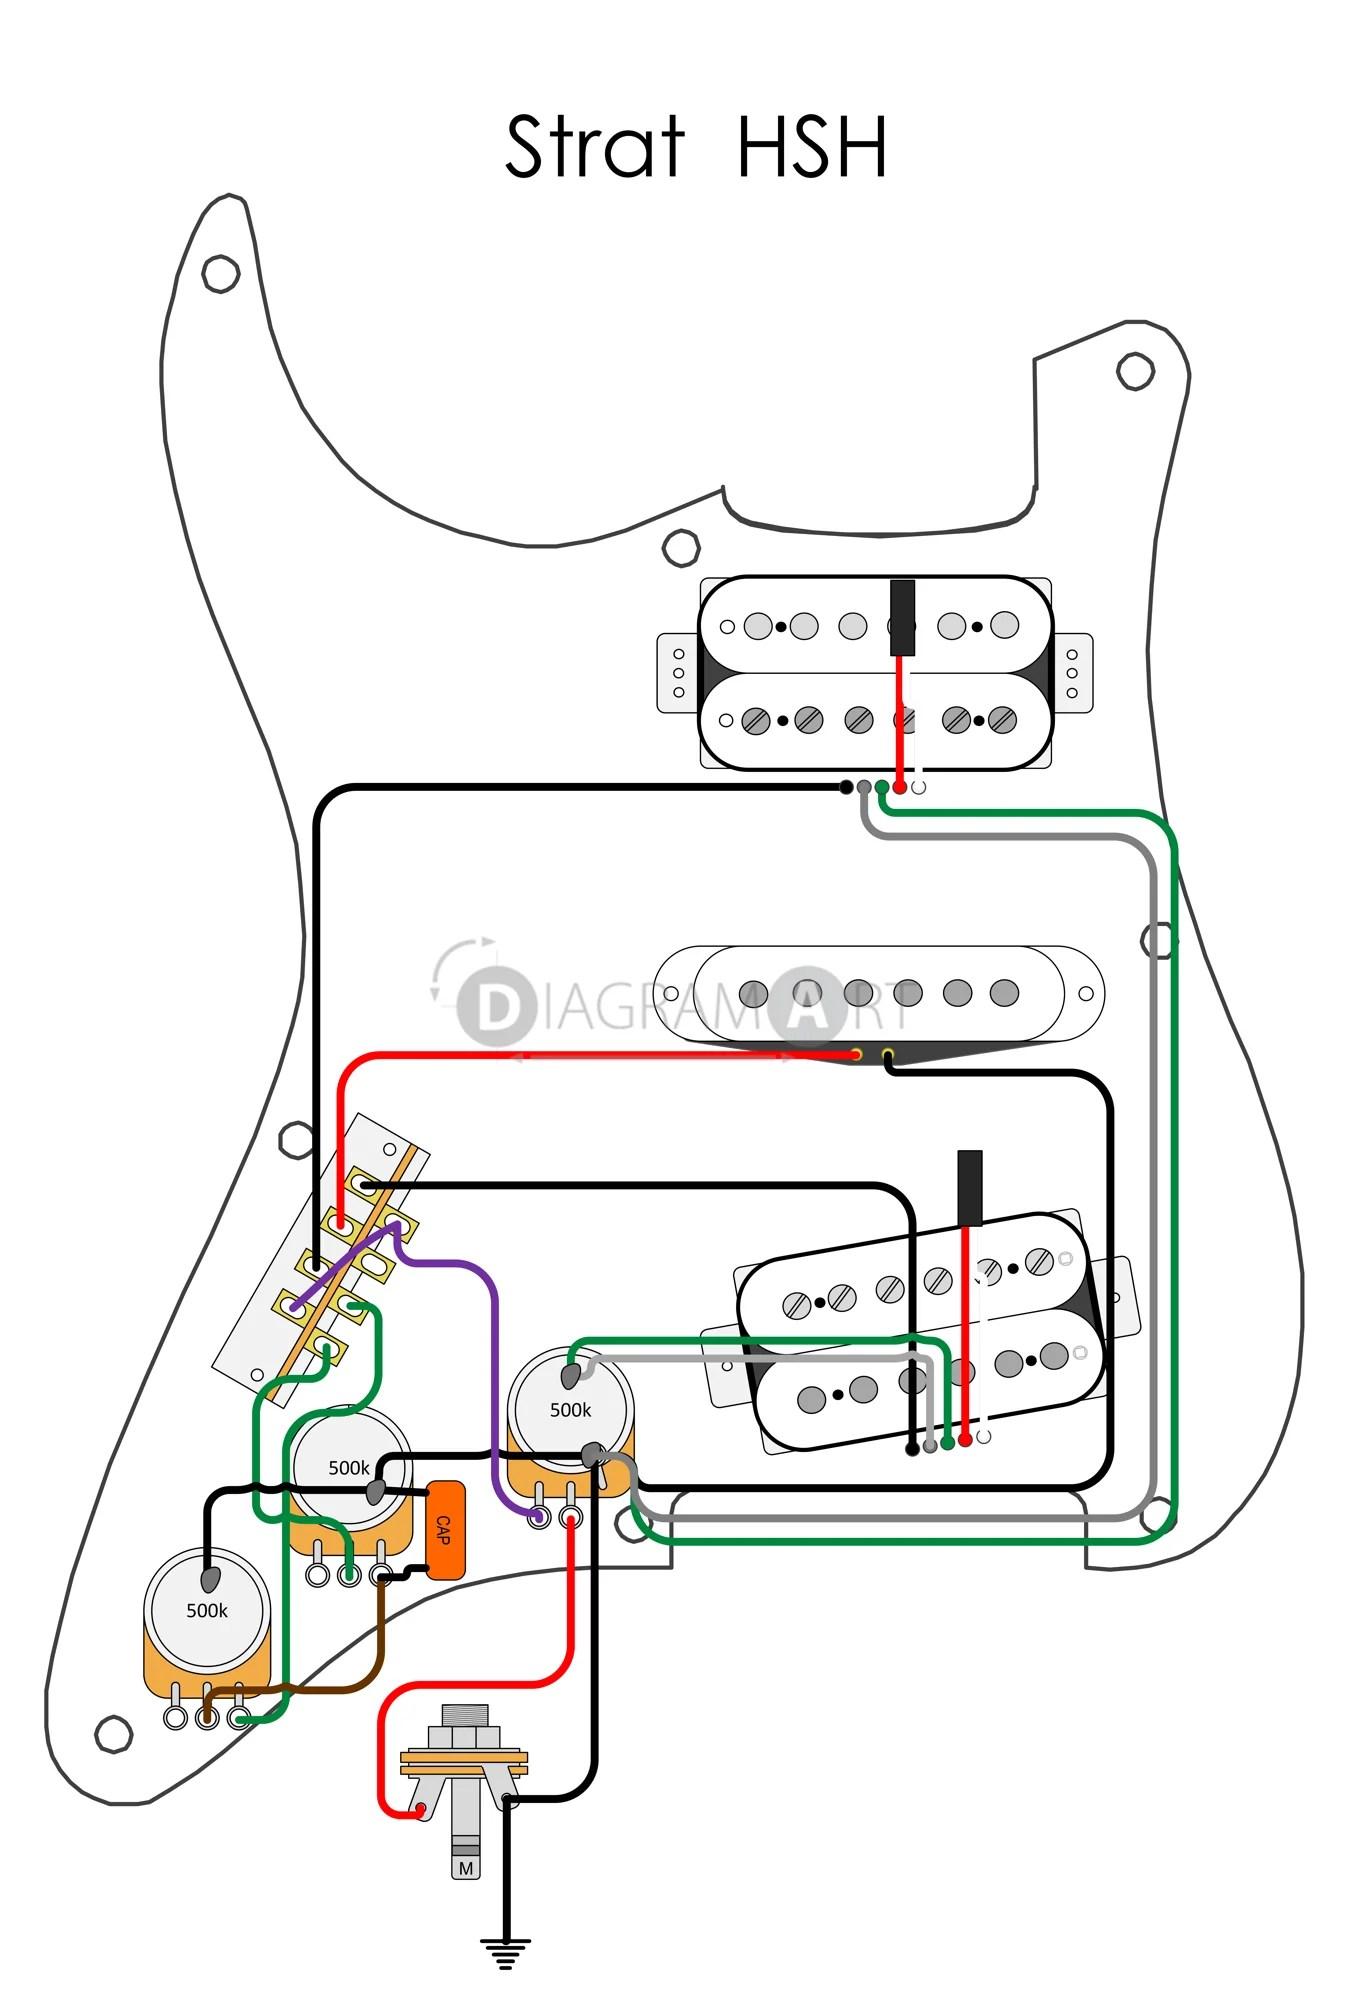 electric guitar wiring strat hsh electric circuit diagramart arbor electric guitars electric guitar wiring [ 1348 x 2000 Pixel ]